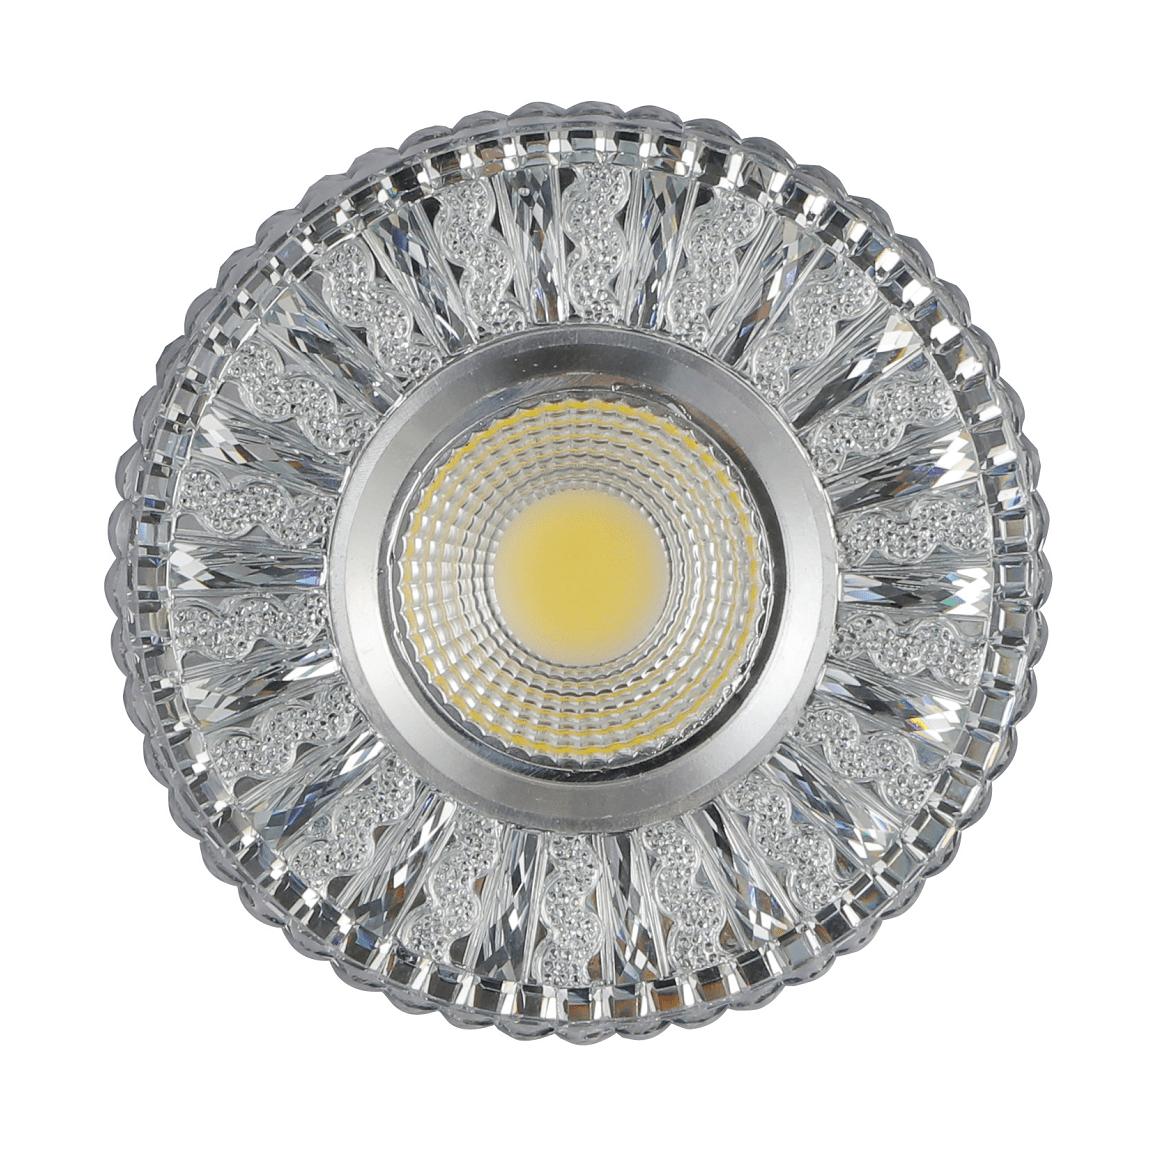 FORLIFE FL-1824 - 5 Watt Kristal LED Spot